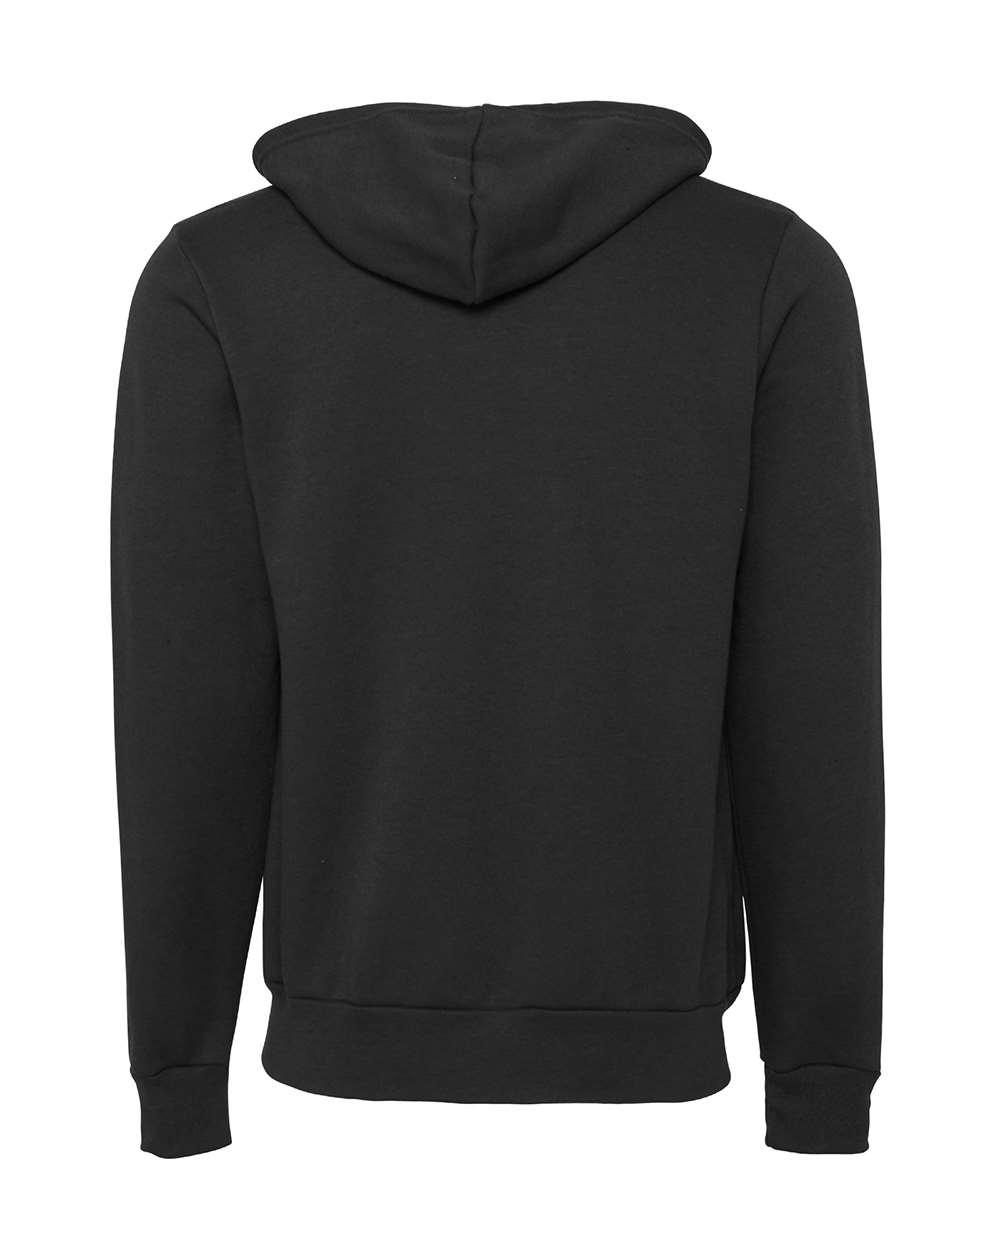 Bella-Canvas-Unisex-Full-Zip-Up-Hooded-Sweatshirt-Blank-Hoodie-3739-up-to-3XL thumbnail 27